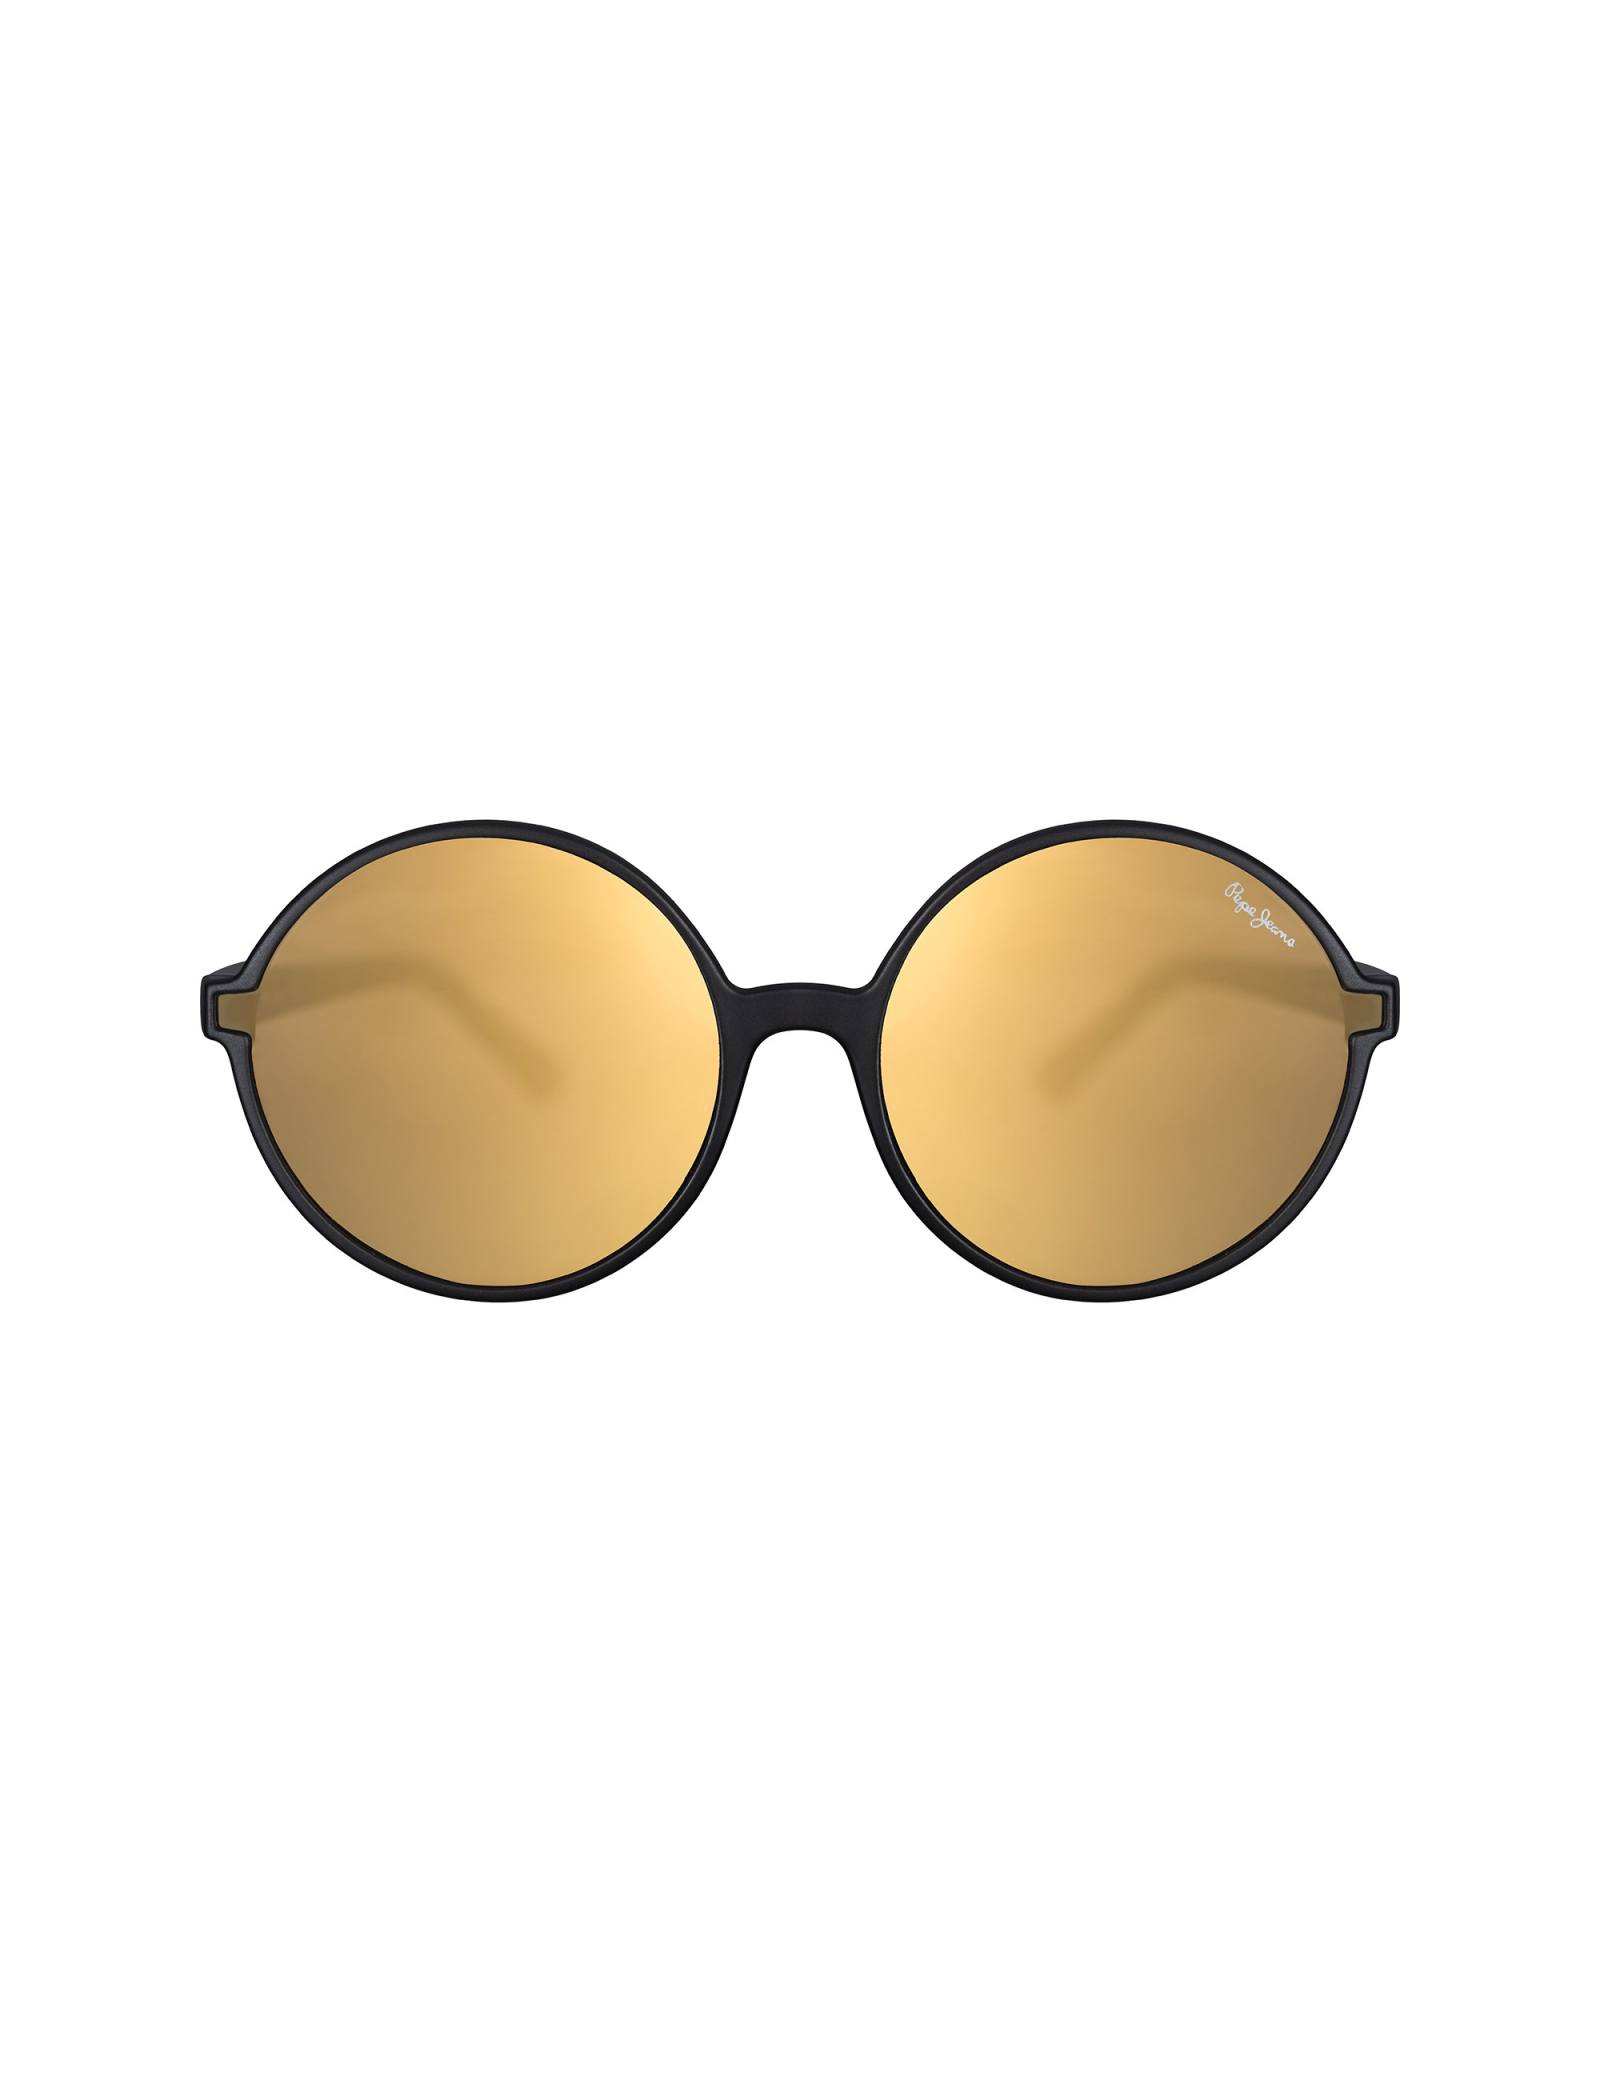 عینک آفتابی گرد زنانه - پپه جینز - زغالي - 1